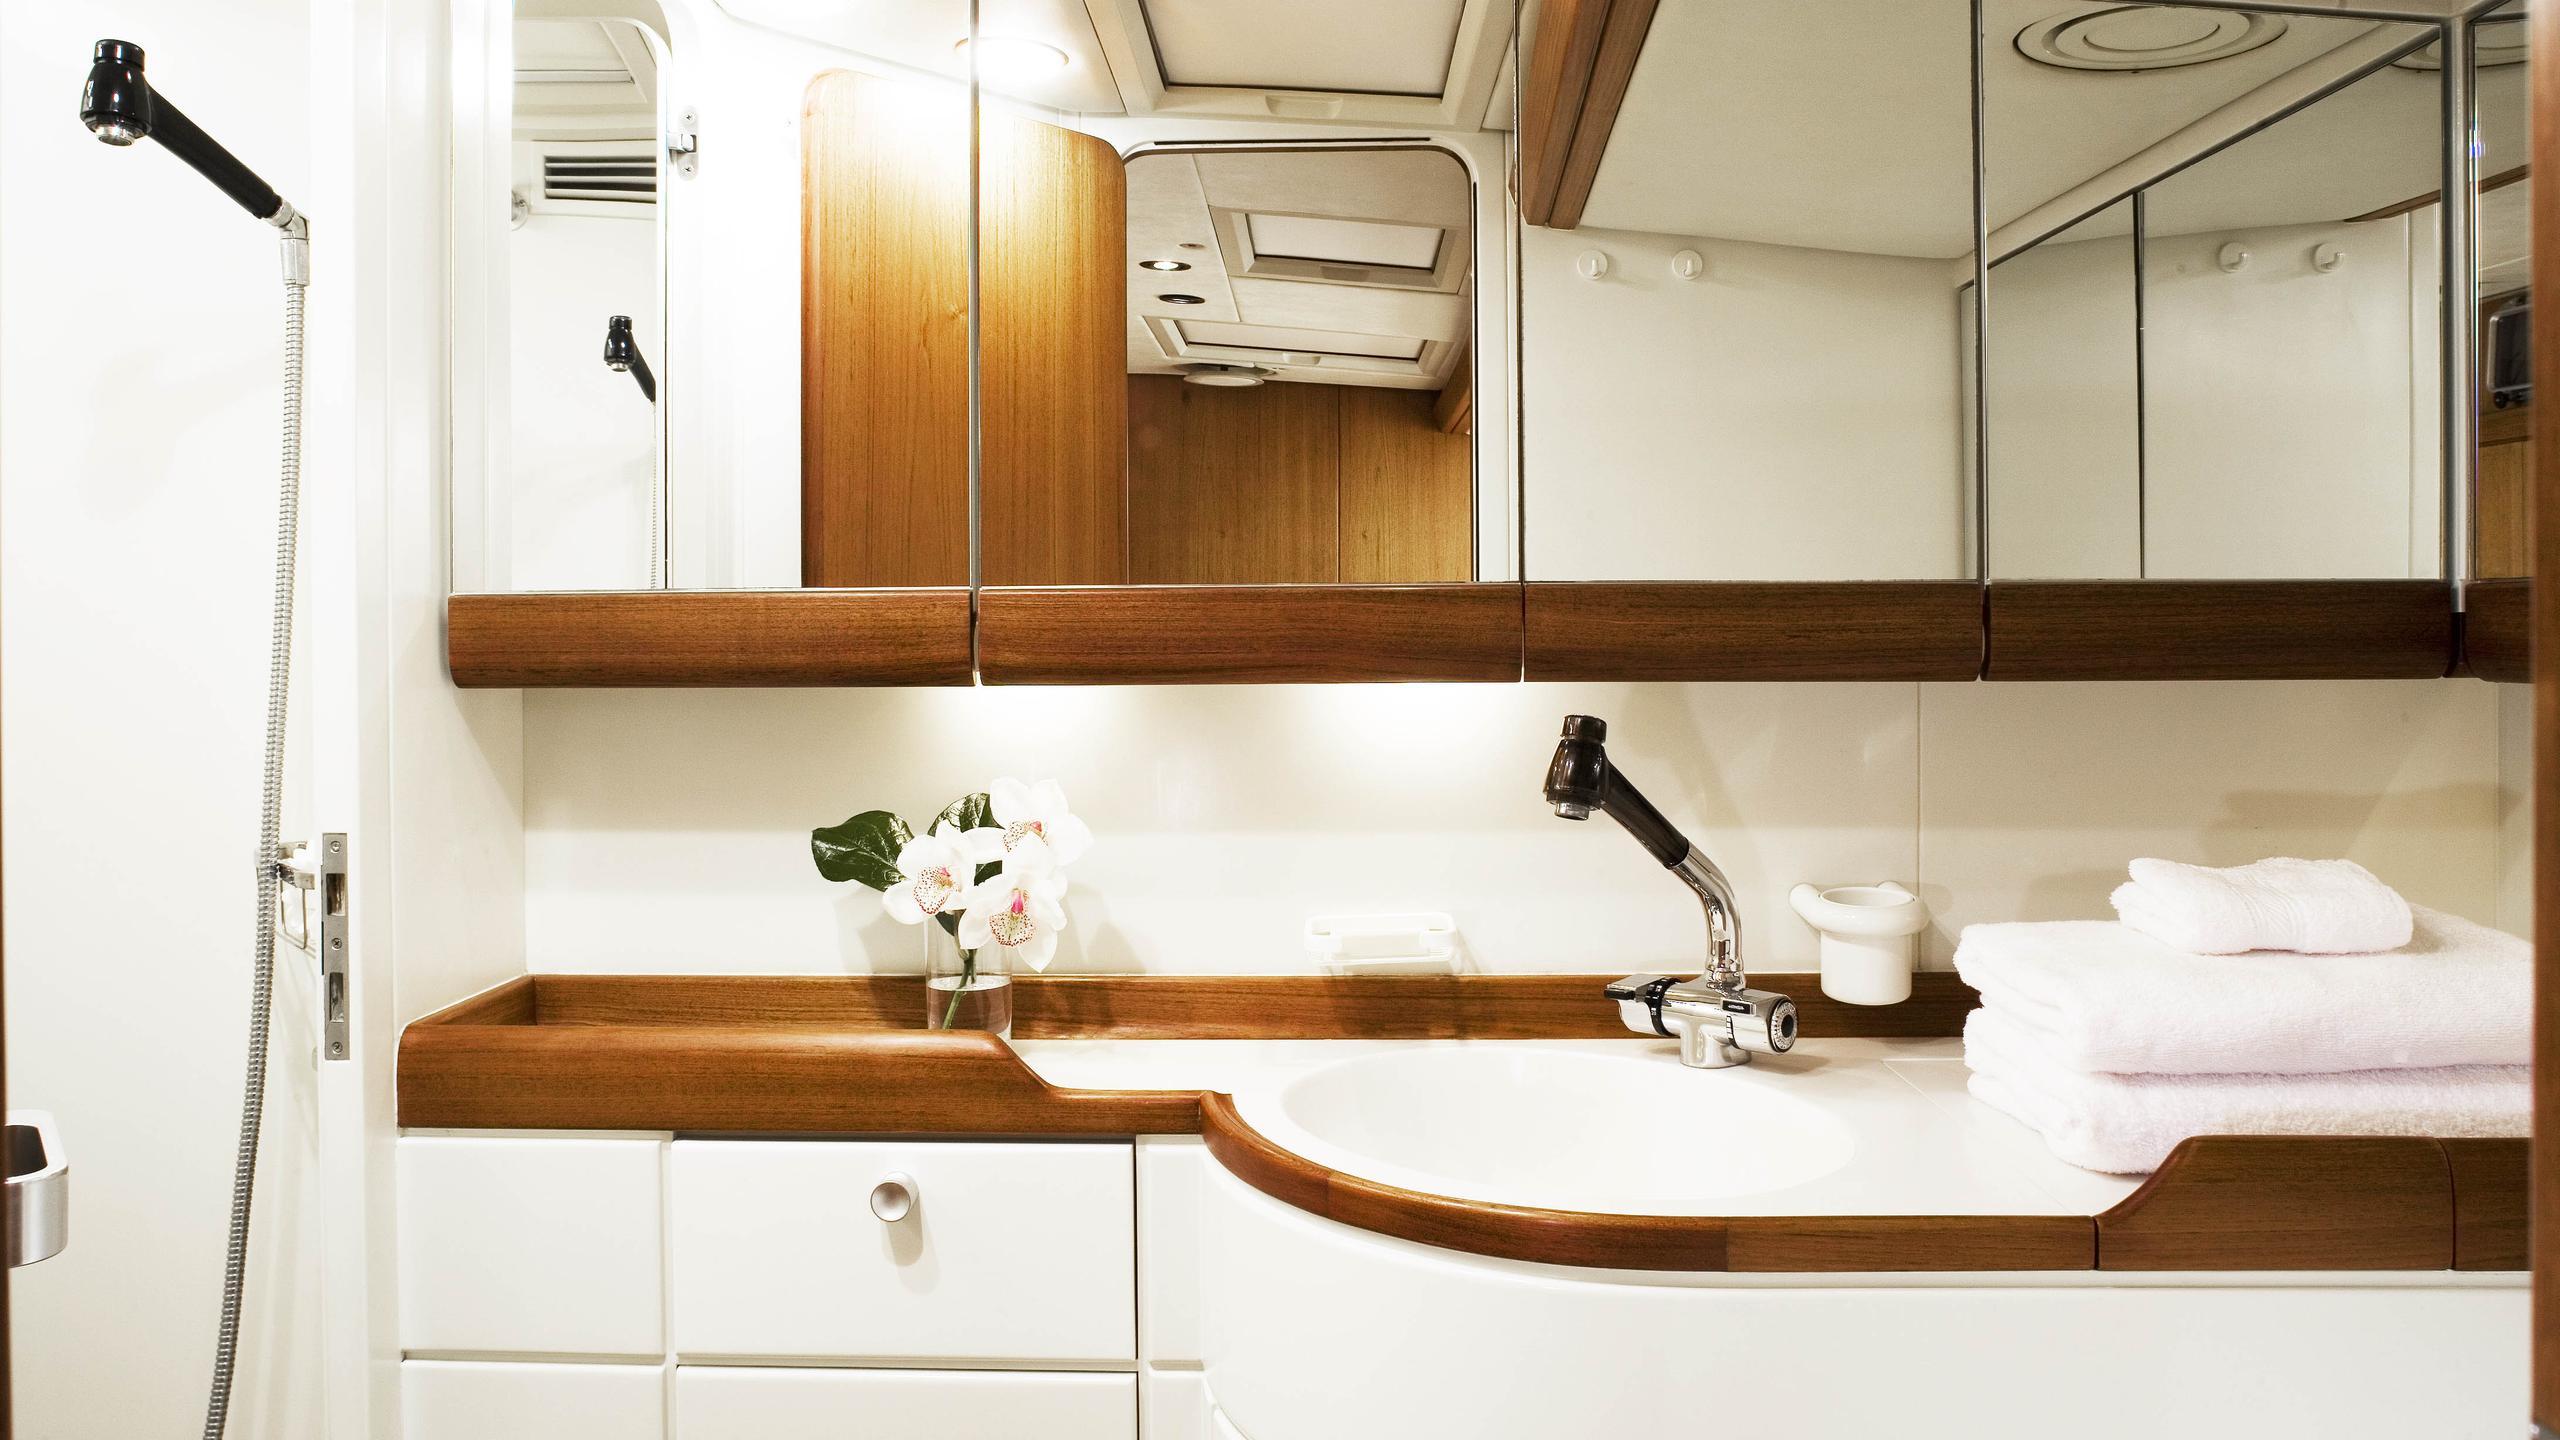 cyclos ii sailing yacht royal huisman 28m 1985 bathroom